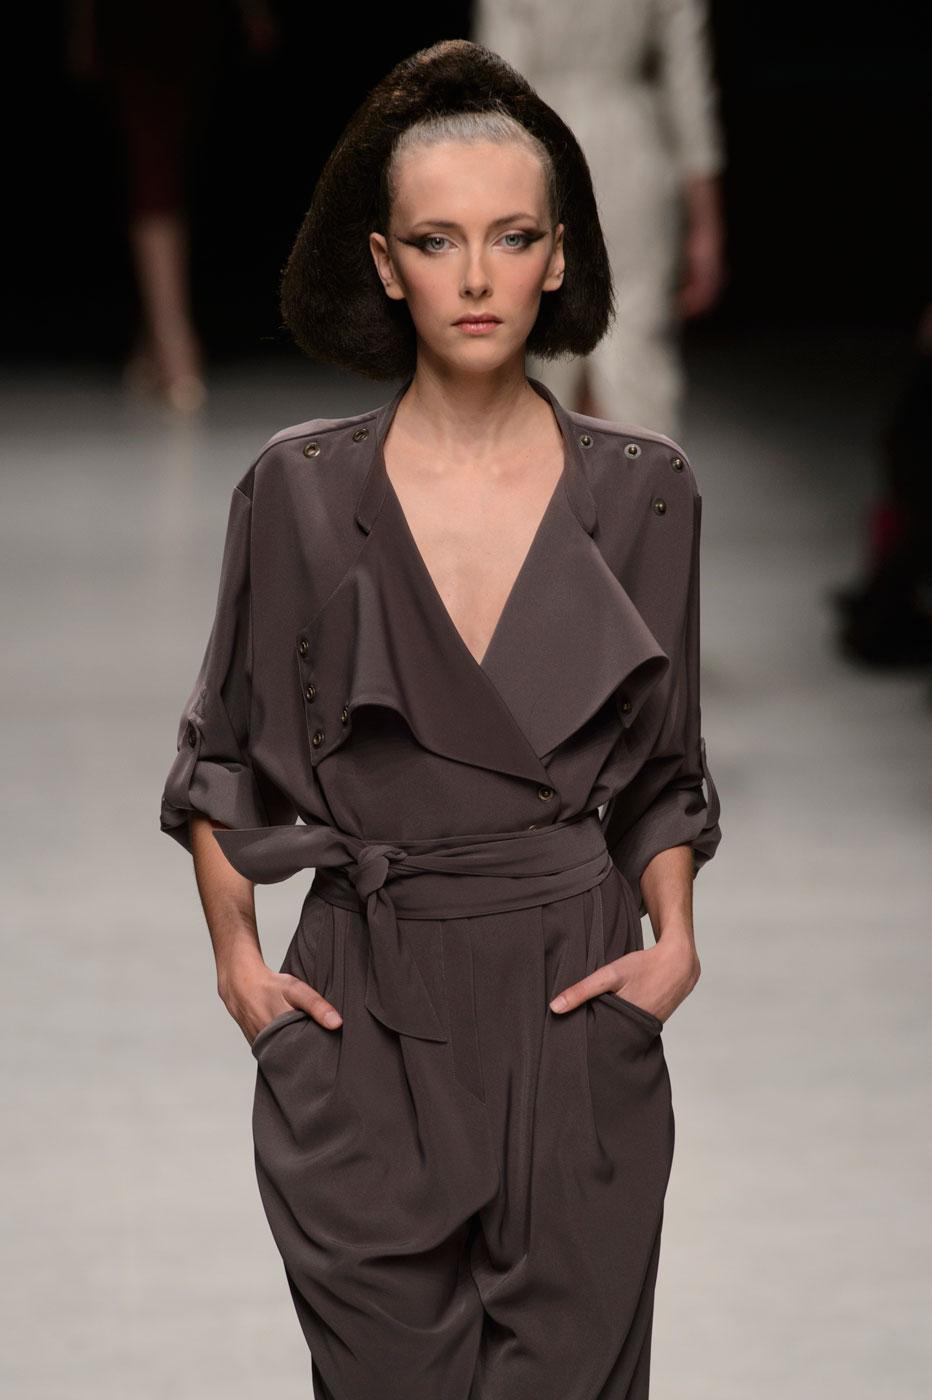 Julien-Fournie-Prive-fashion-runway-show-haute-couture-paris-spring-2015-the-impression-05